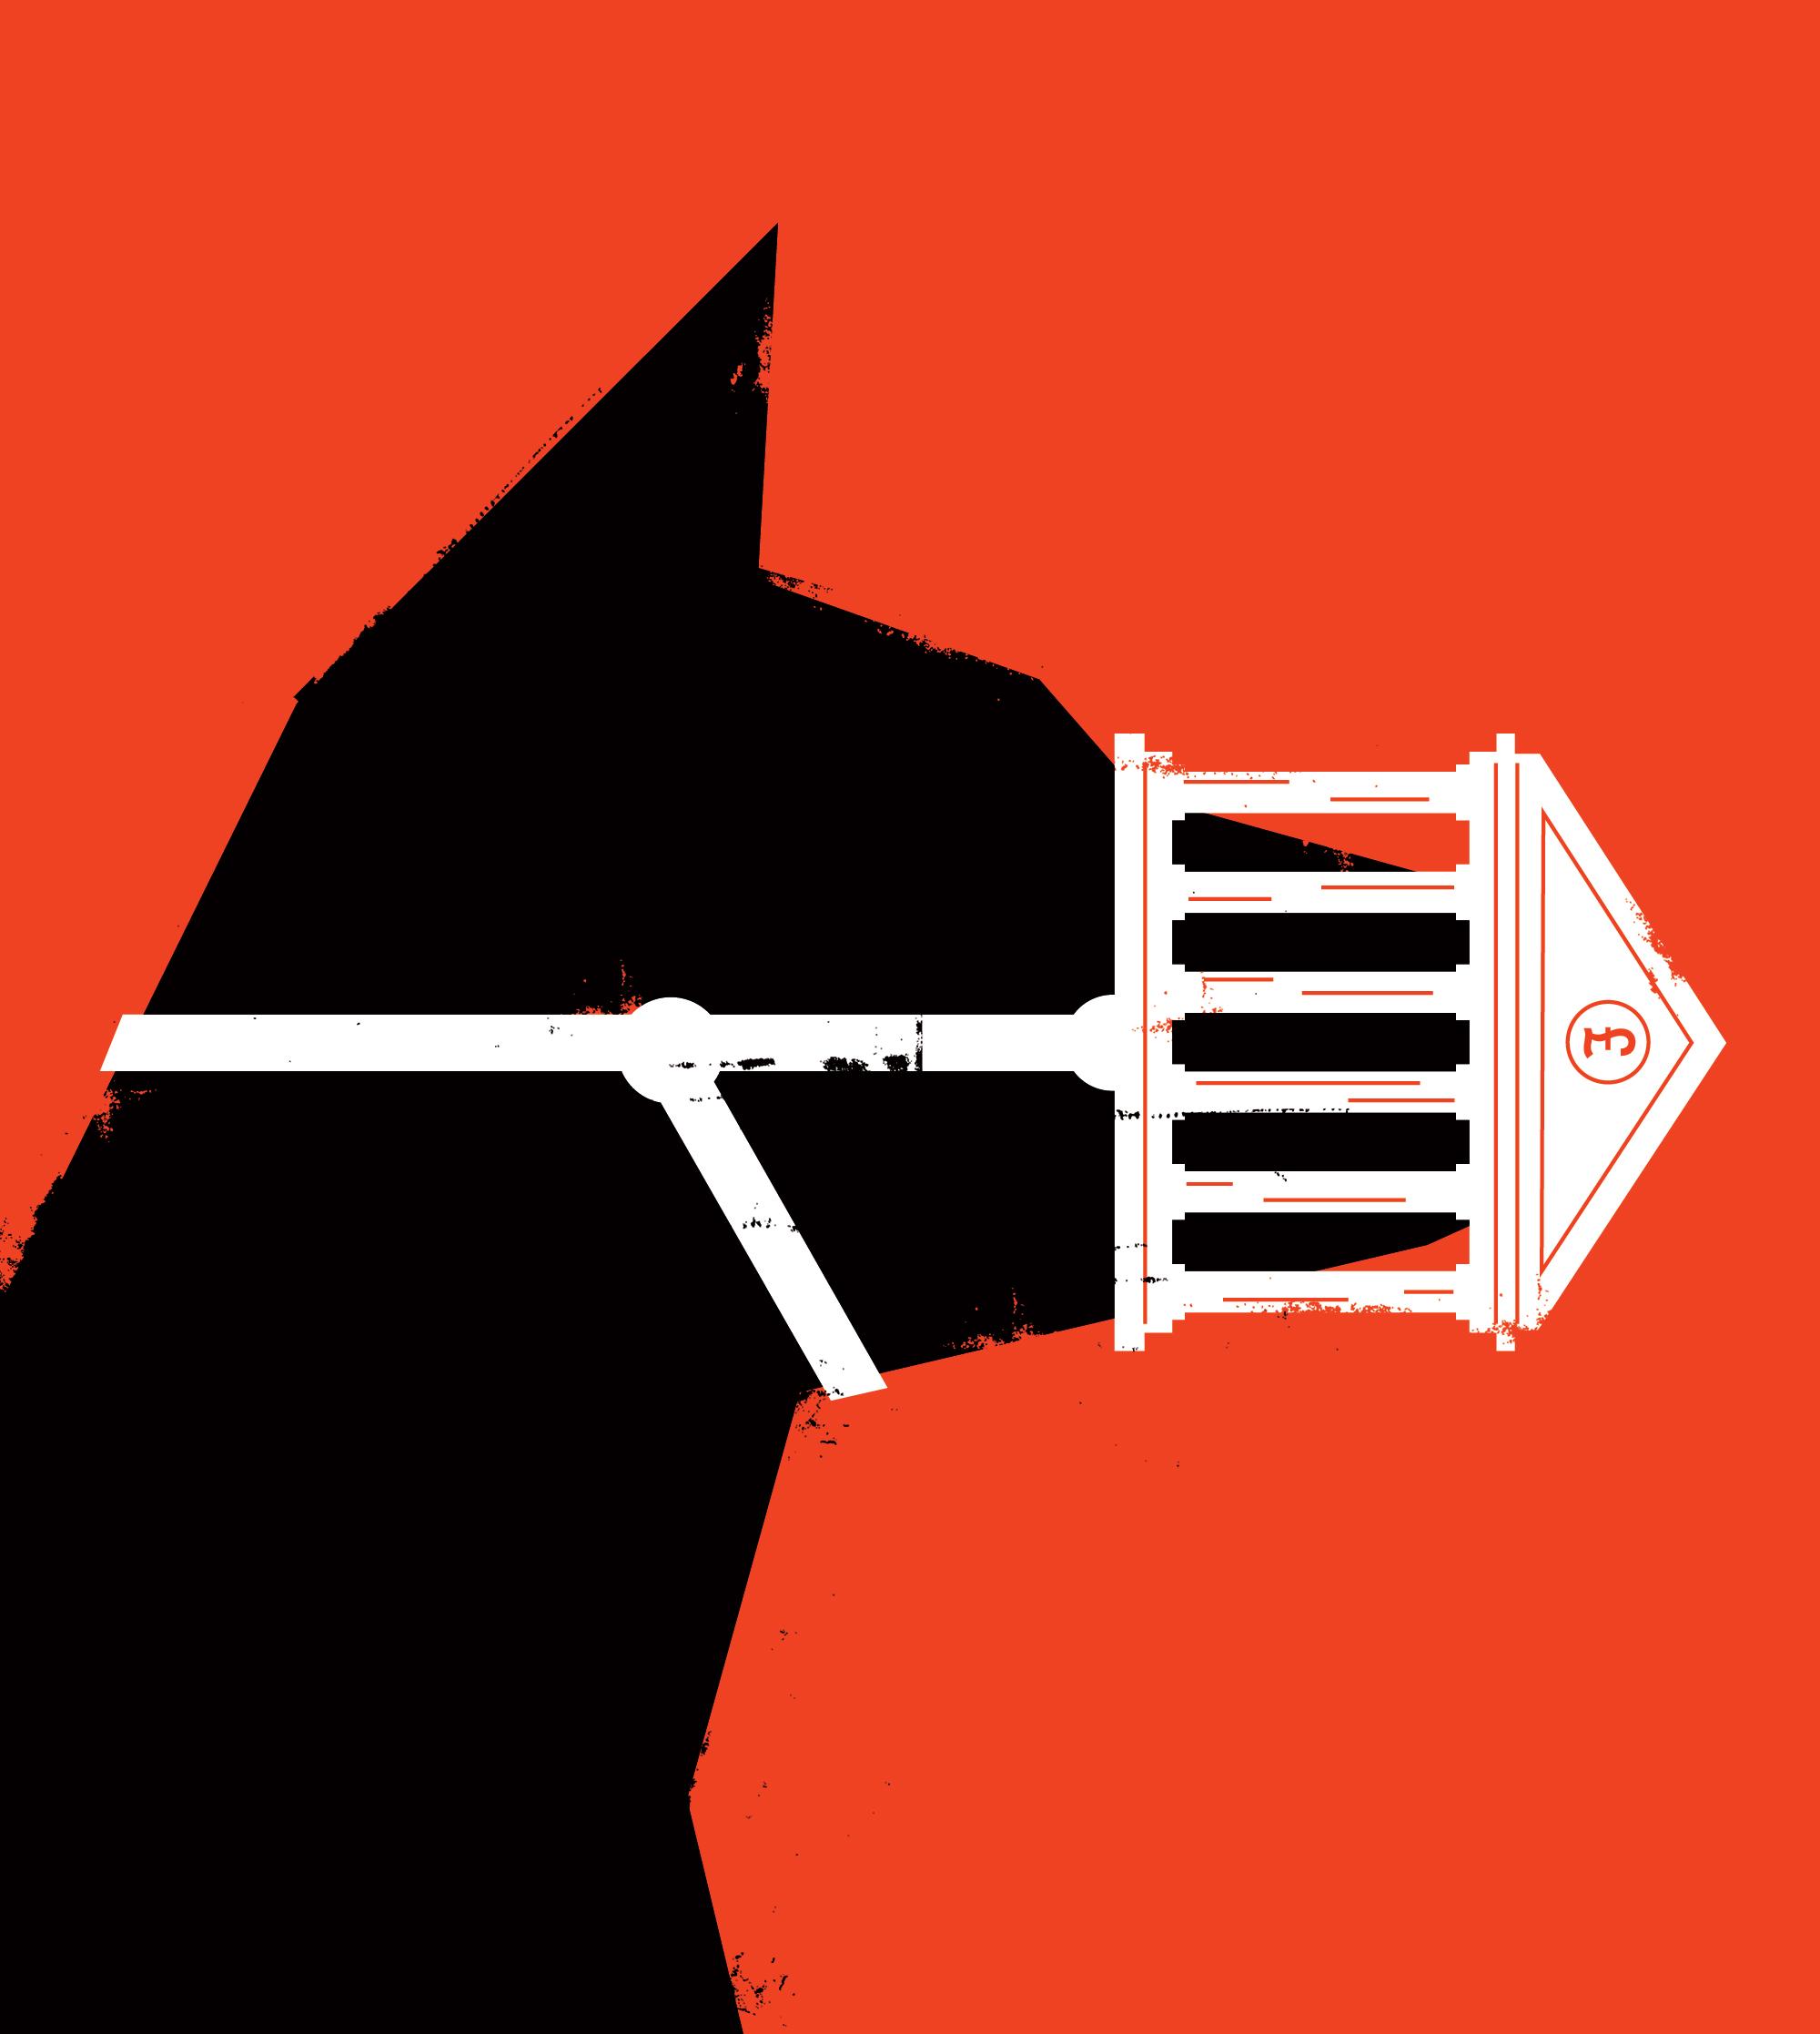 Banking Watchdog Loses It's Bite